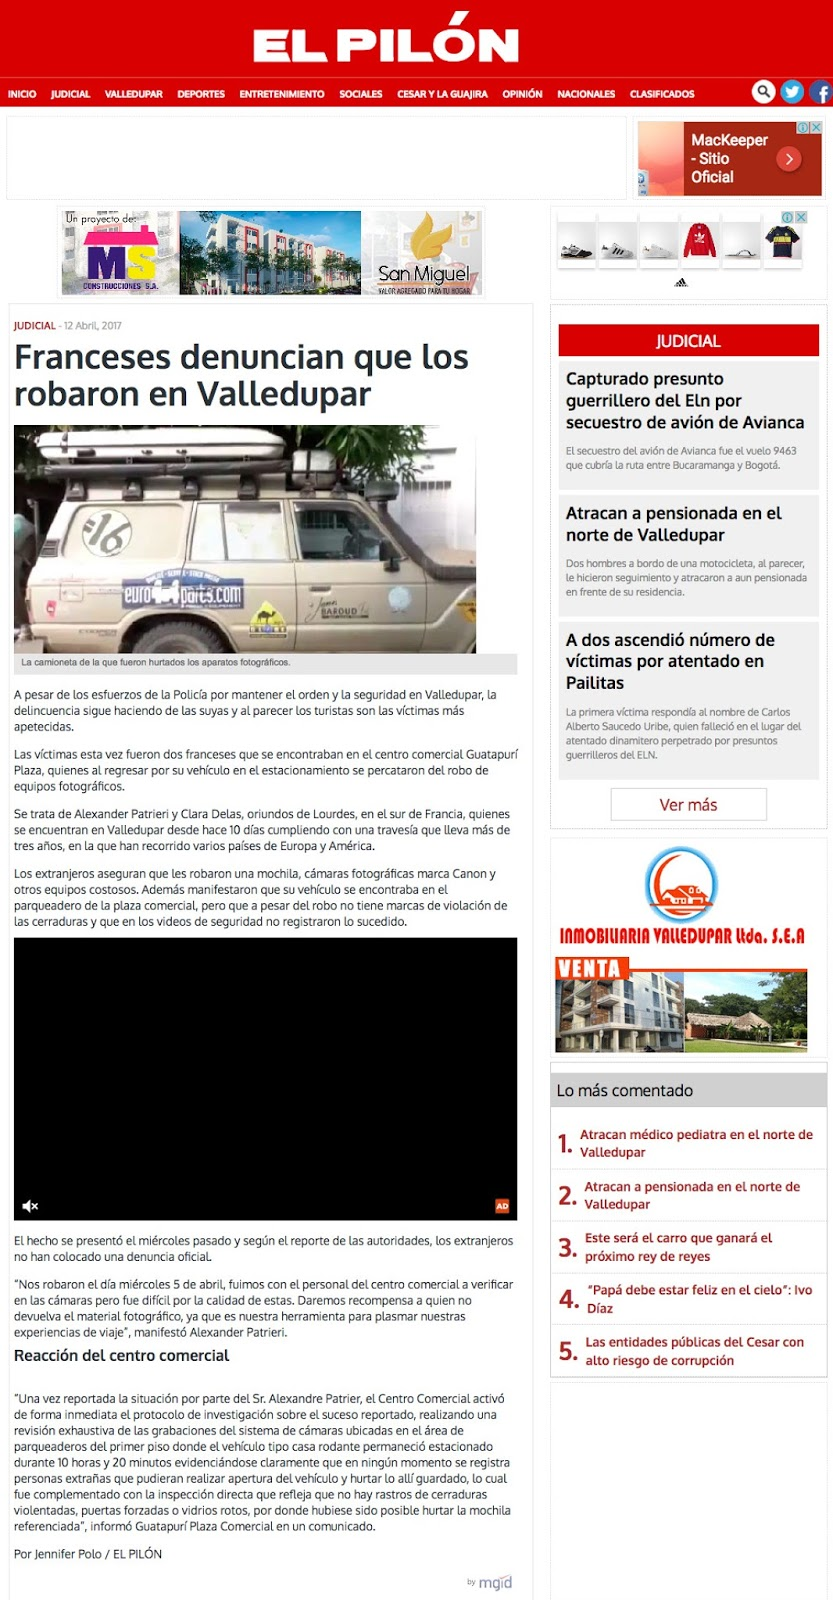 http://elpilon.com.co/franceses-denuncian-los-robaron-valledupar/